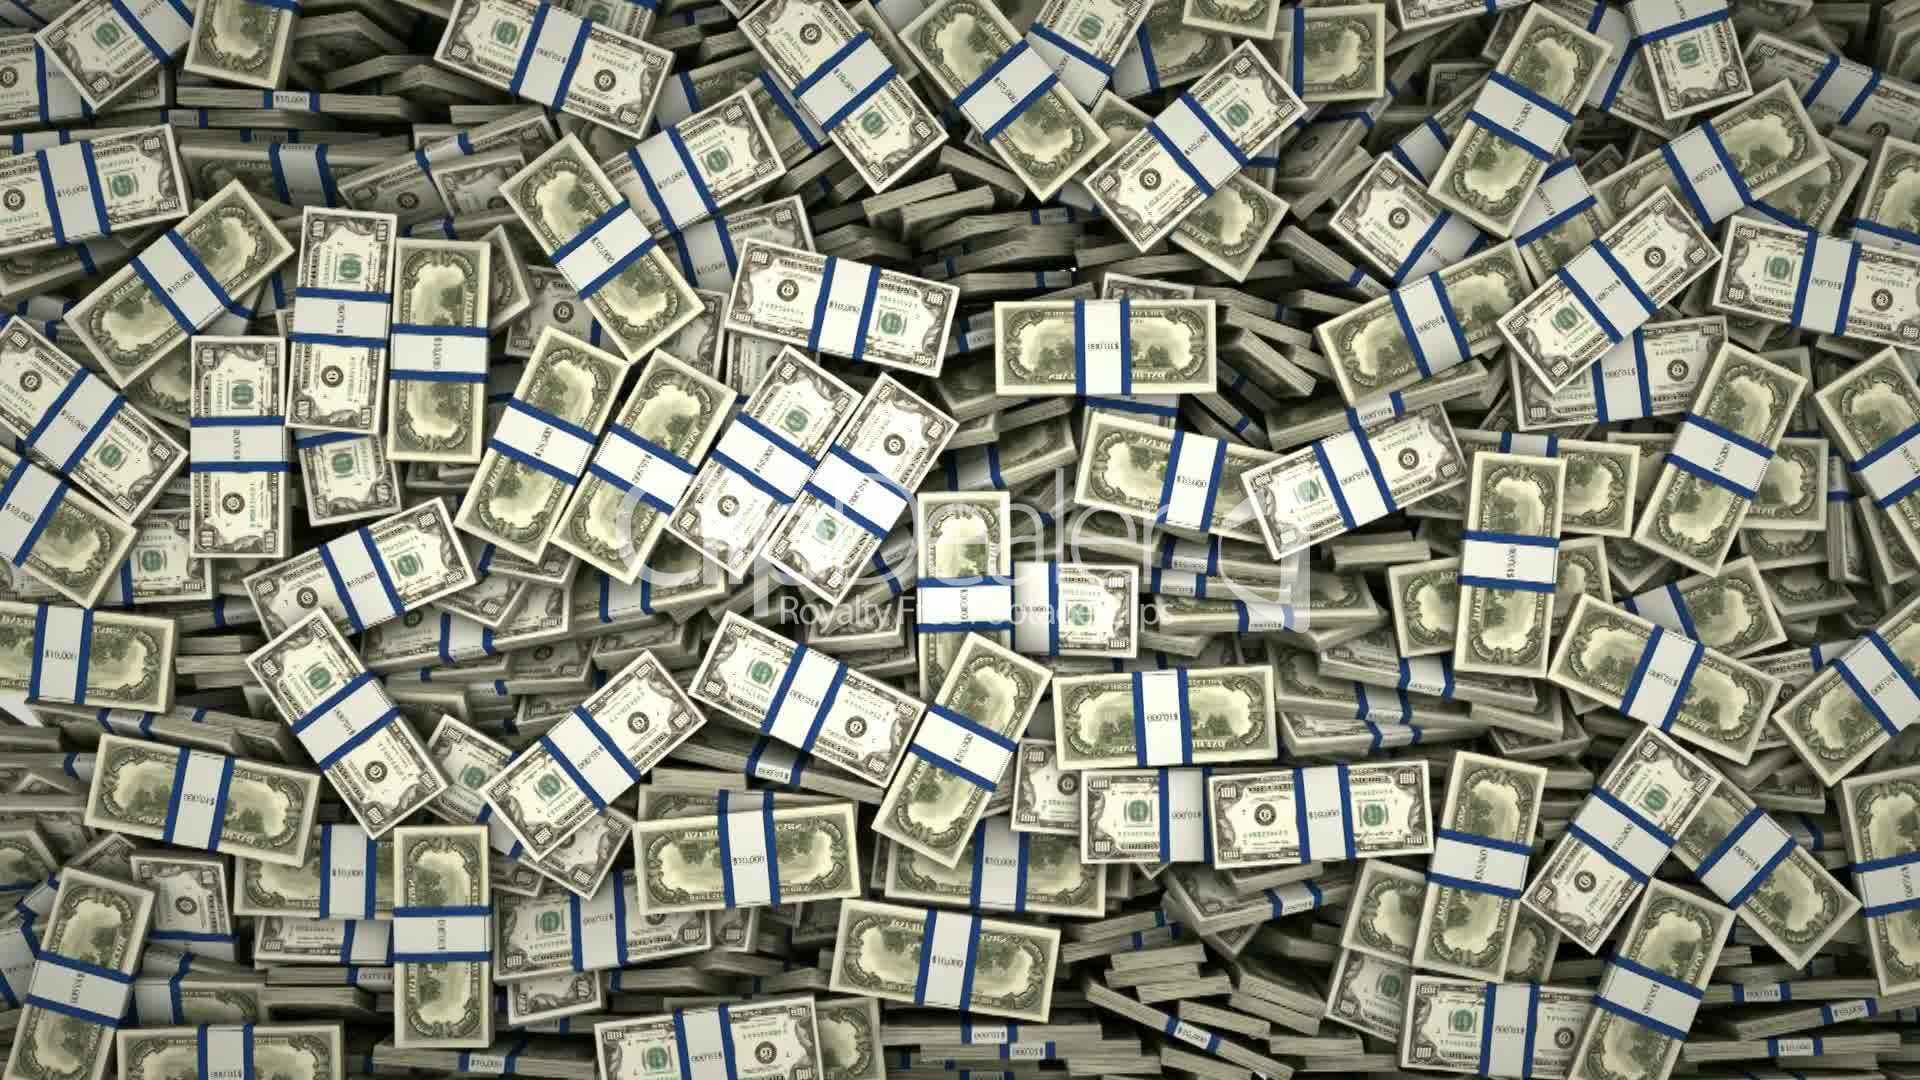 Millionaire wallpapers wallpaper cave - Dollar wallpaper ...